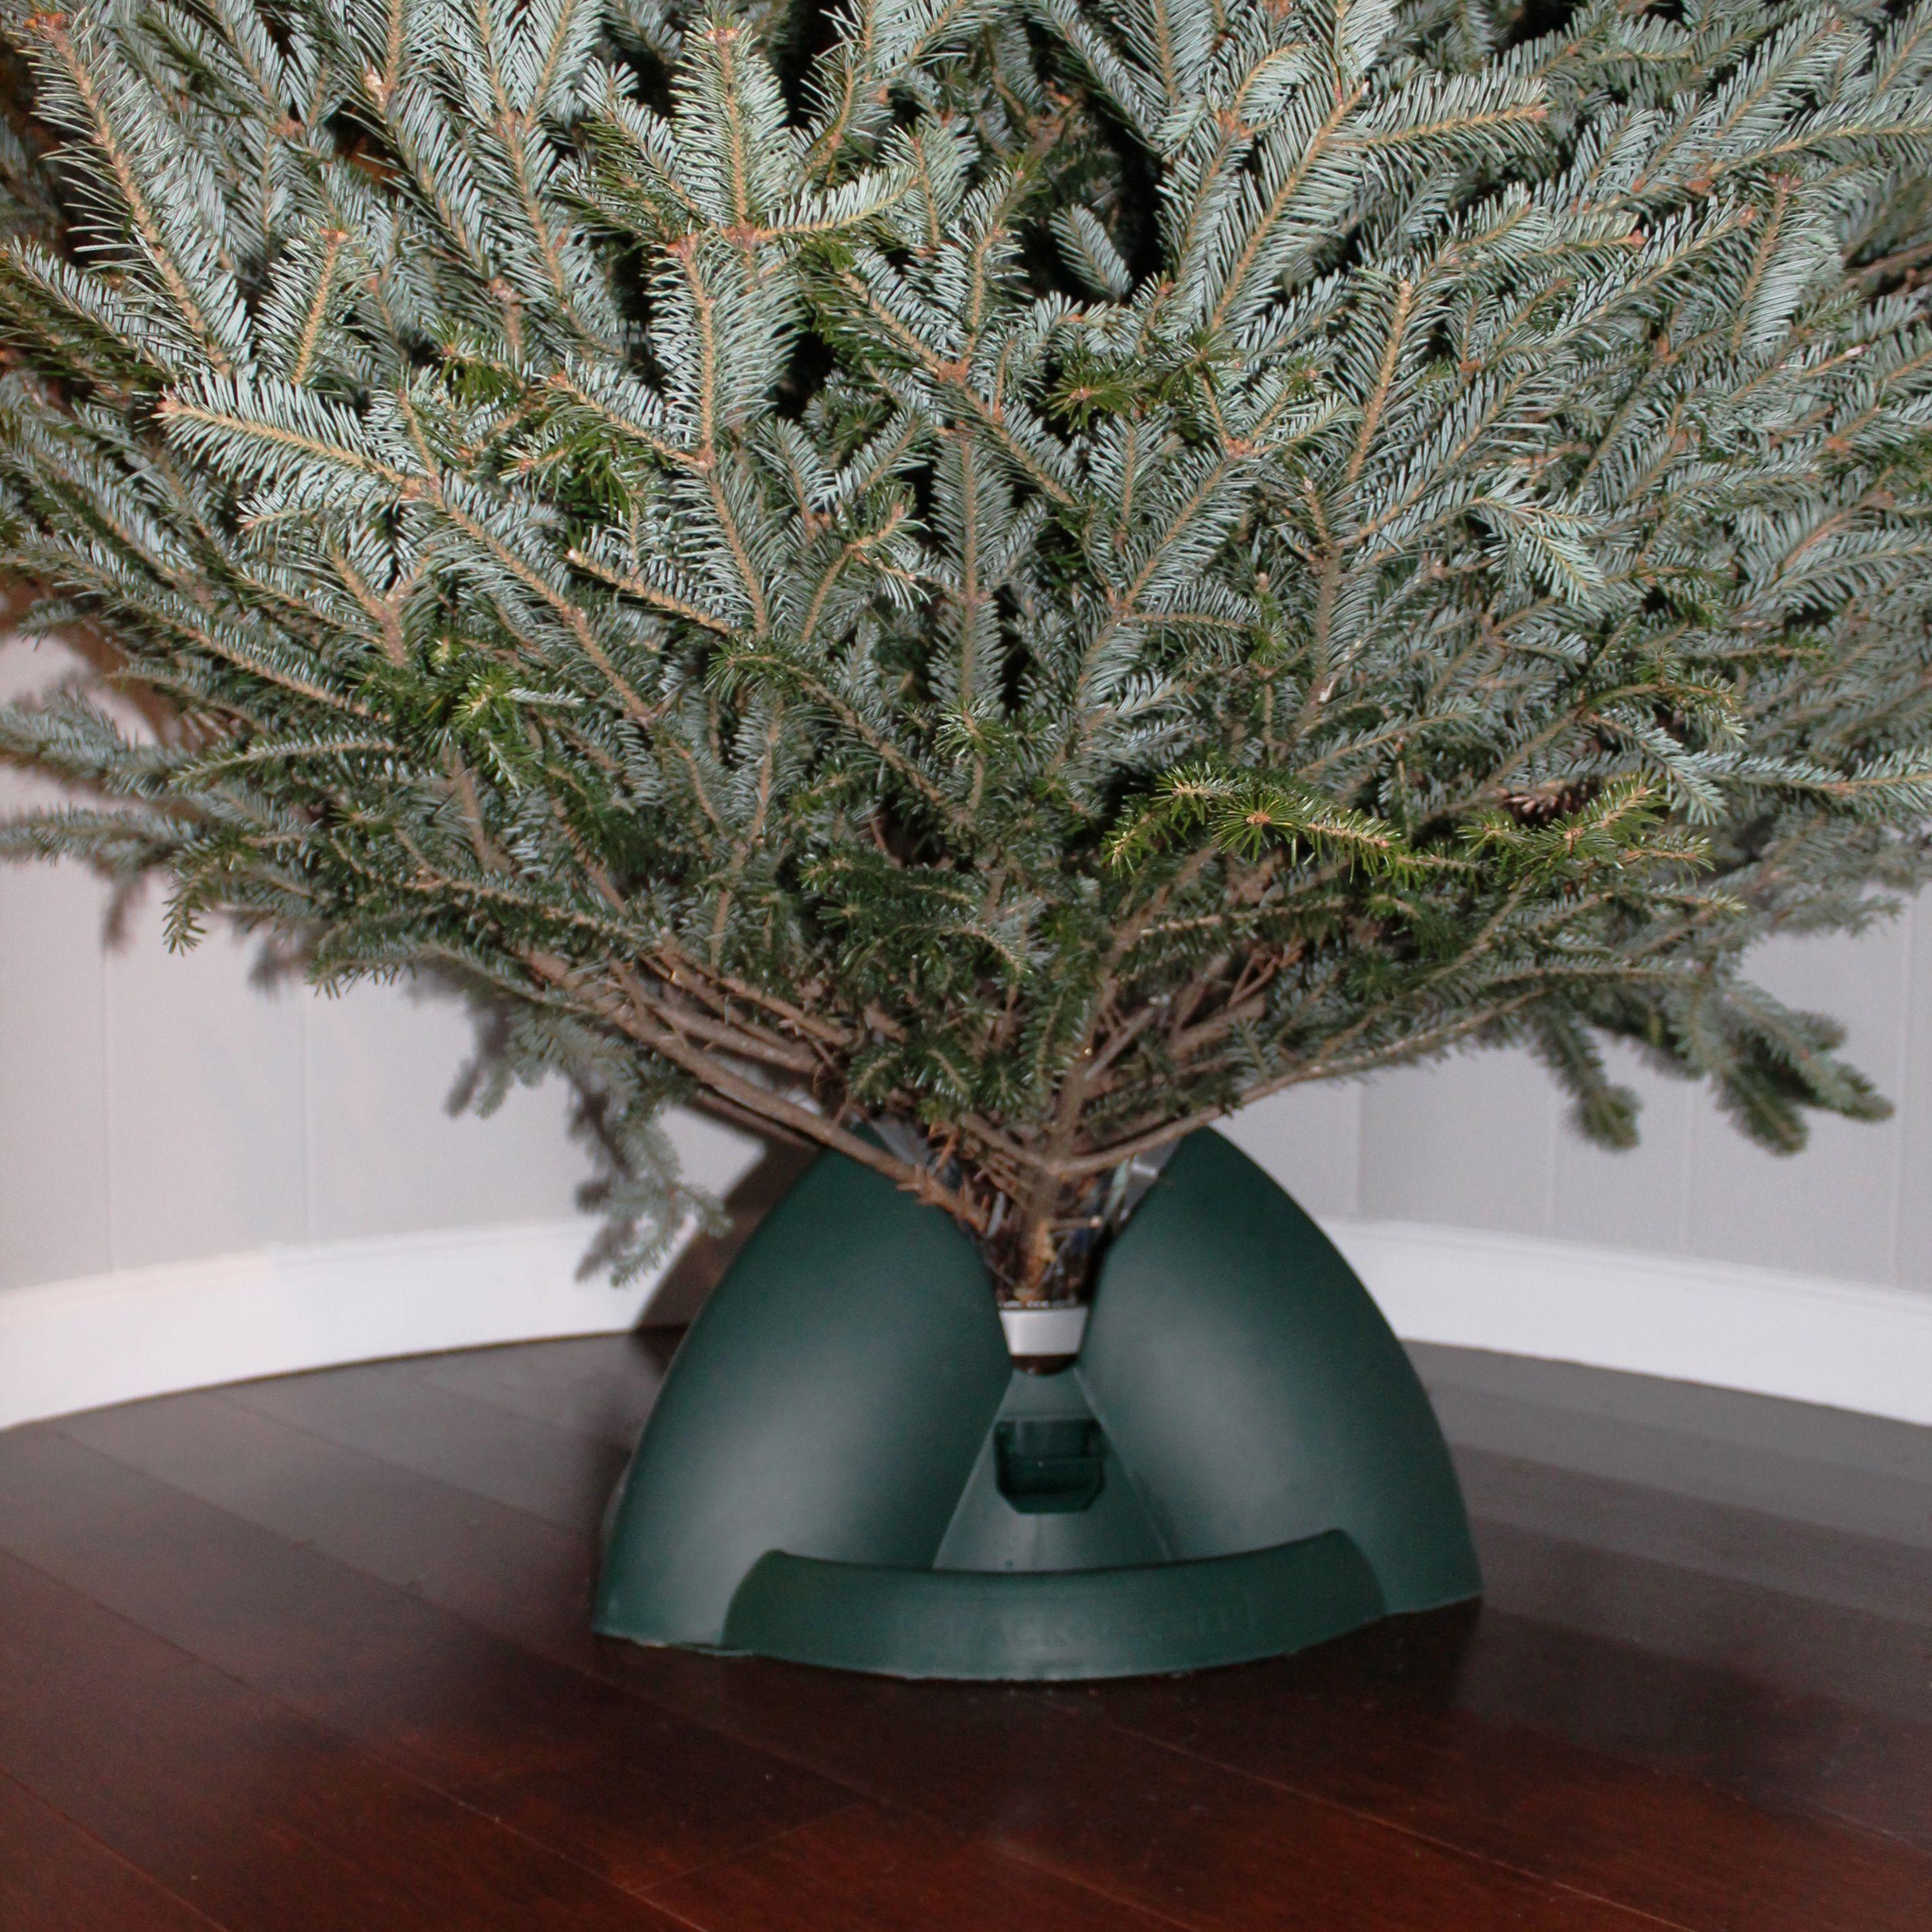 Black & Decker Christmas Tree Smart Stand